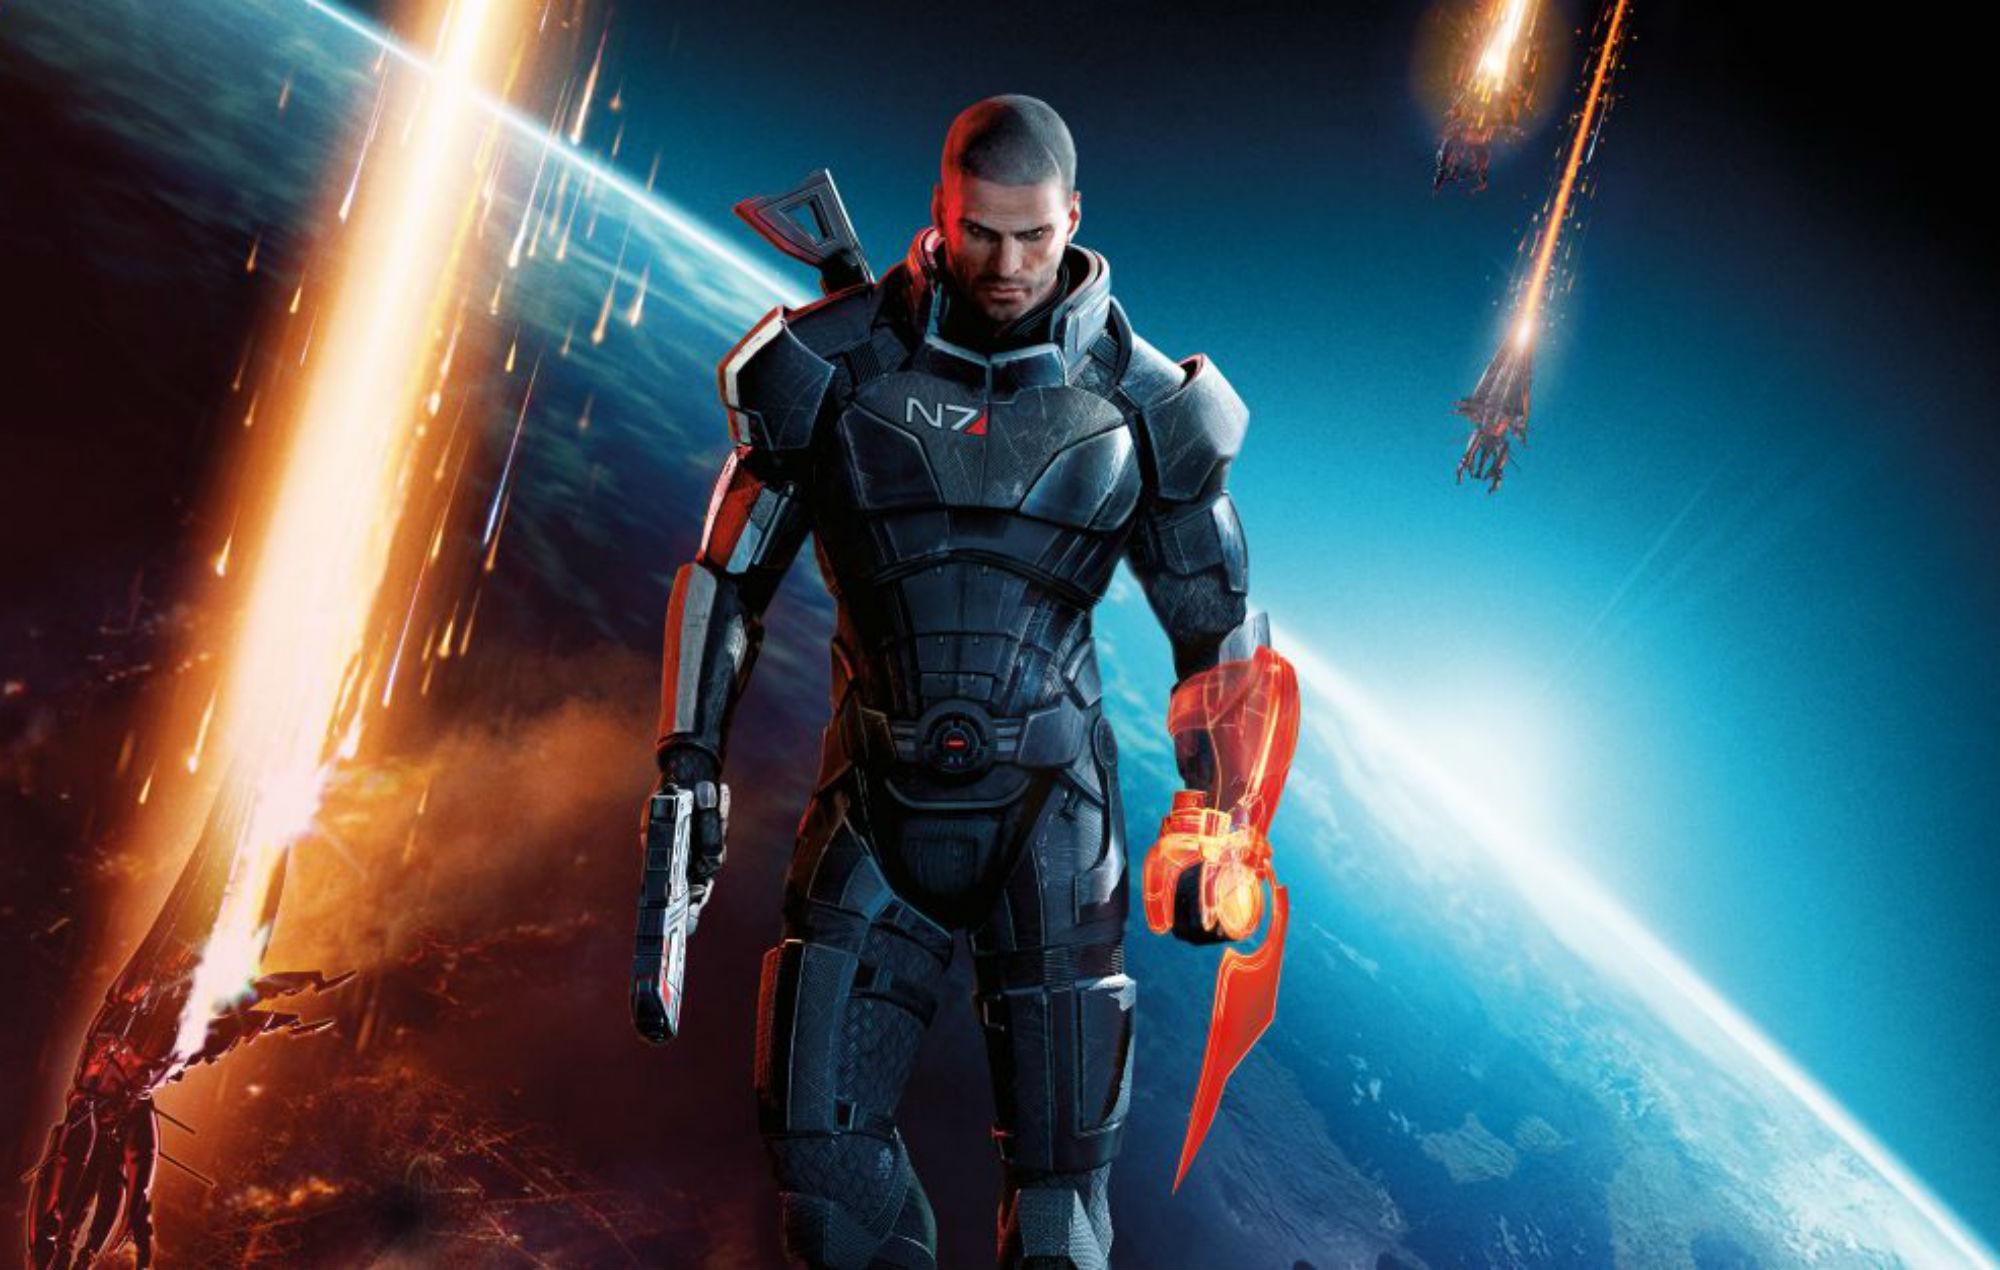 'Mass Effect 2' same-sex romance was cut because of Fox News - NME